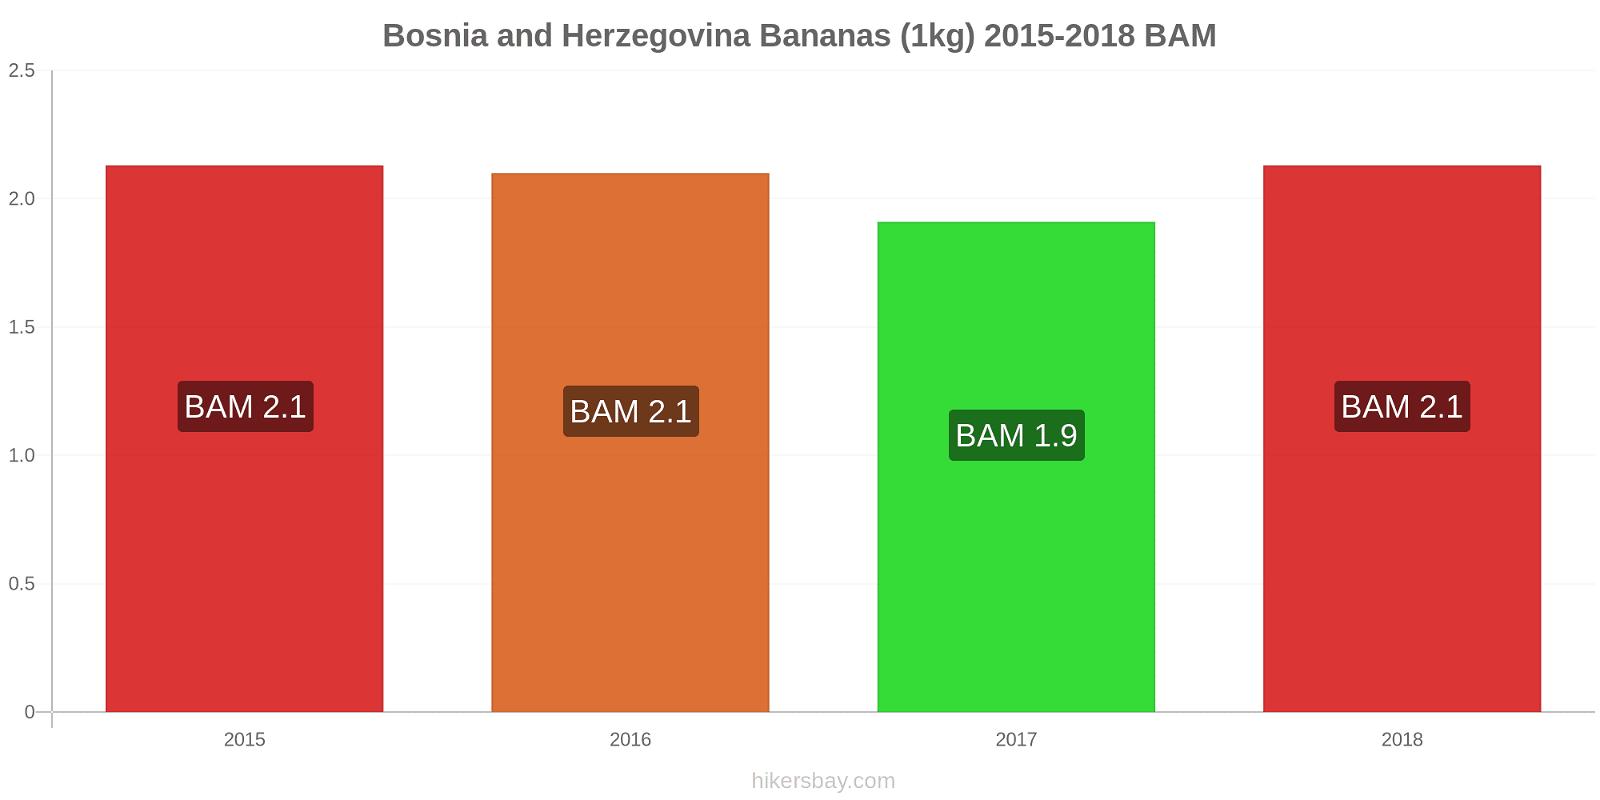 Bosnia and Herzegovina price changes Bananas (1kg) hikersbay.com